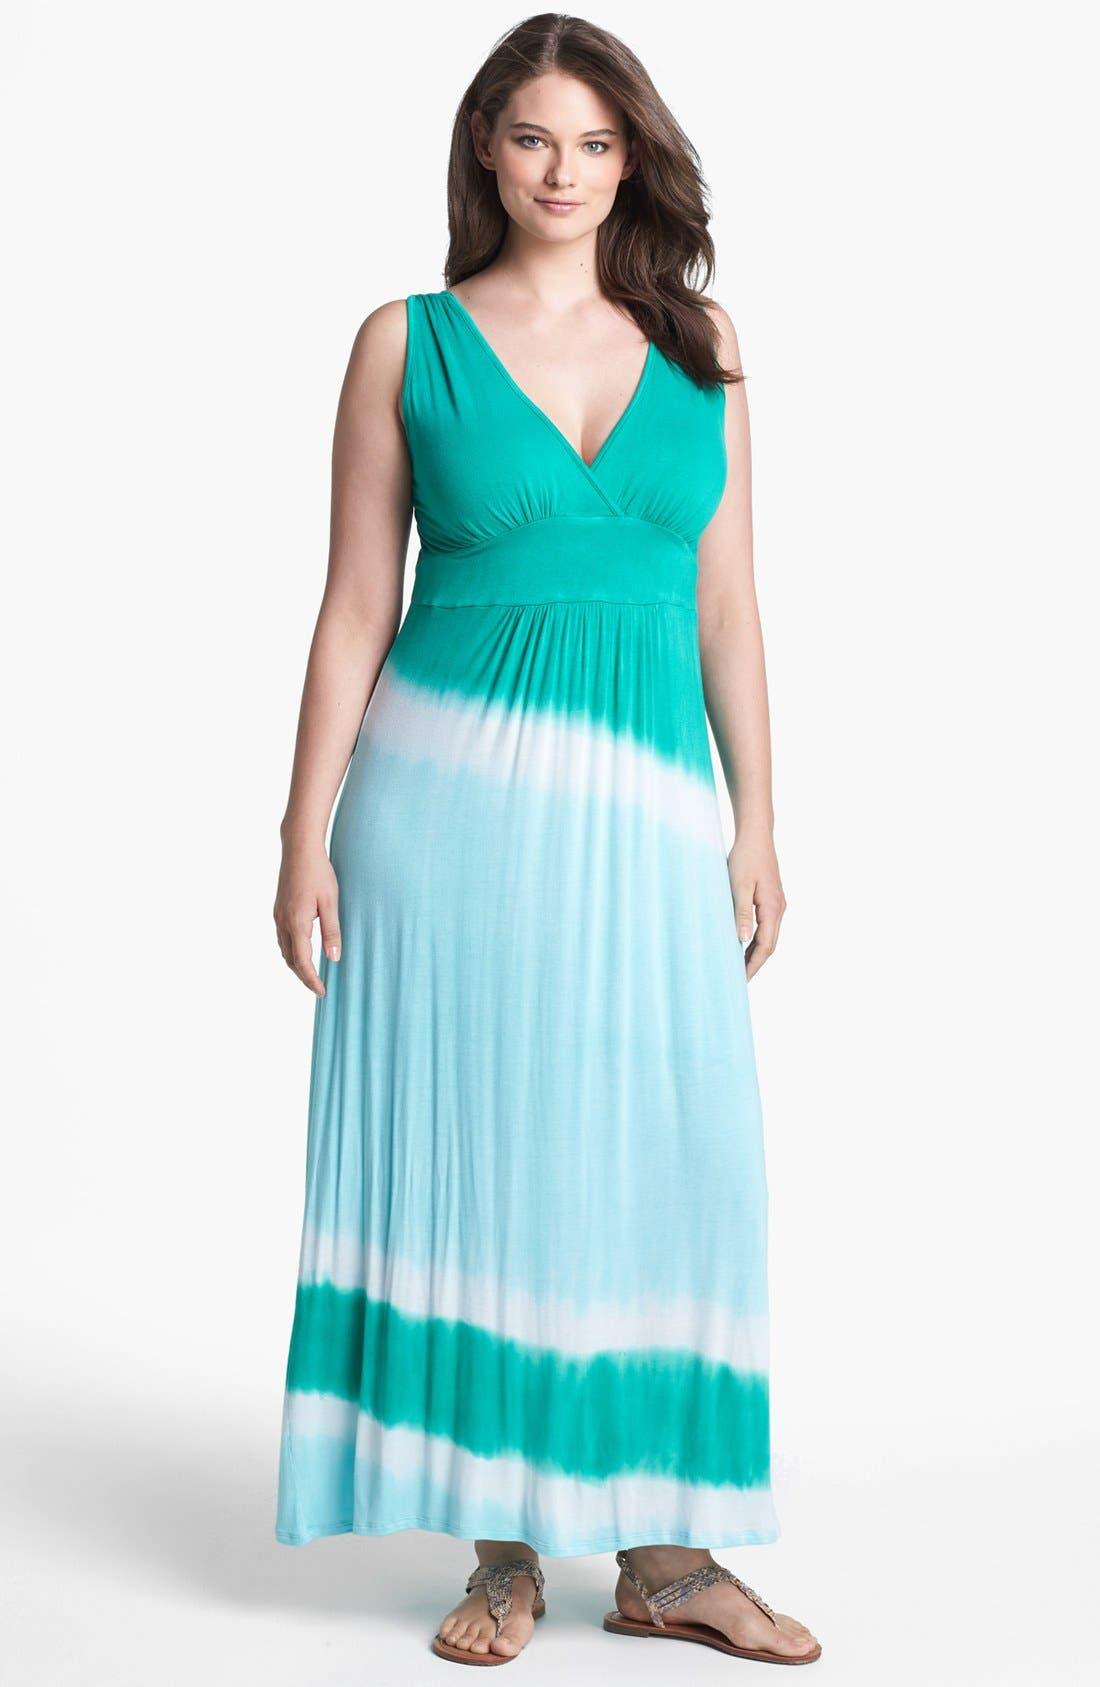 Alternate Image 1 Selected - Loveappella Tie Dye Jersey Maxi Dress (Plus Size)